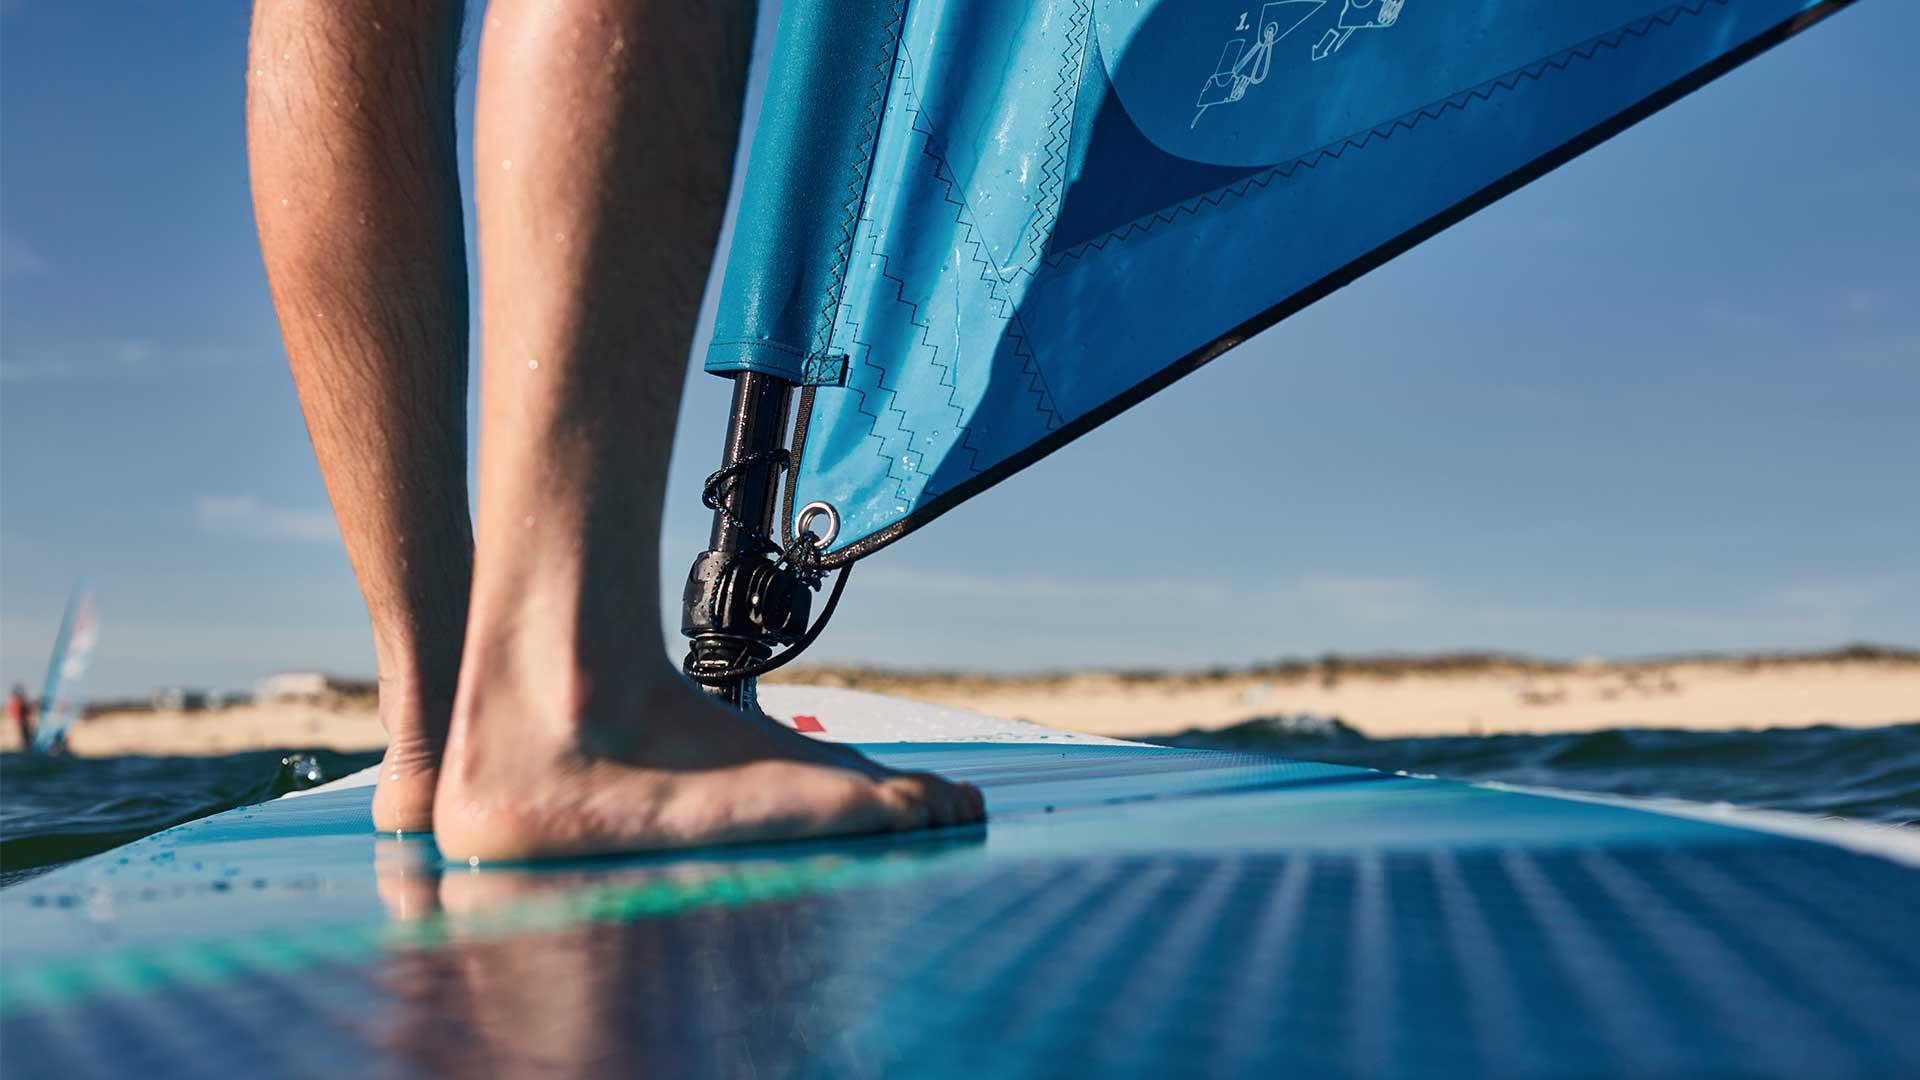 redpaddleco-107-windsurf-inflatable-paddle-board-desktop-gallery-2